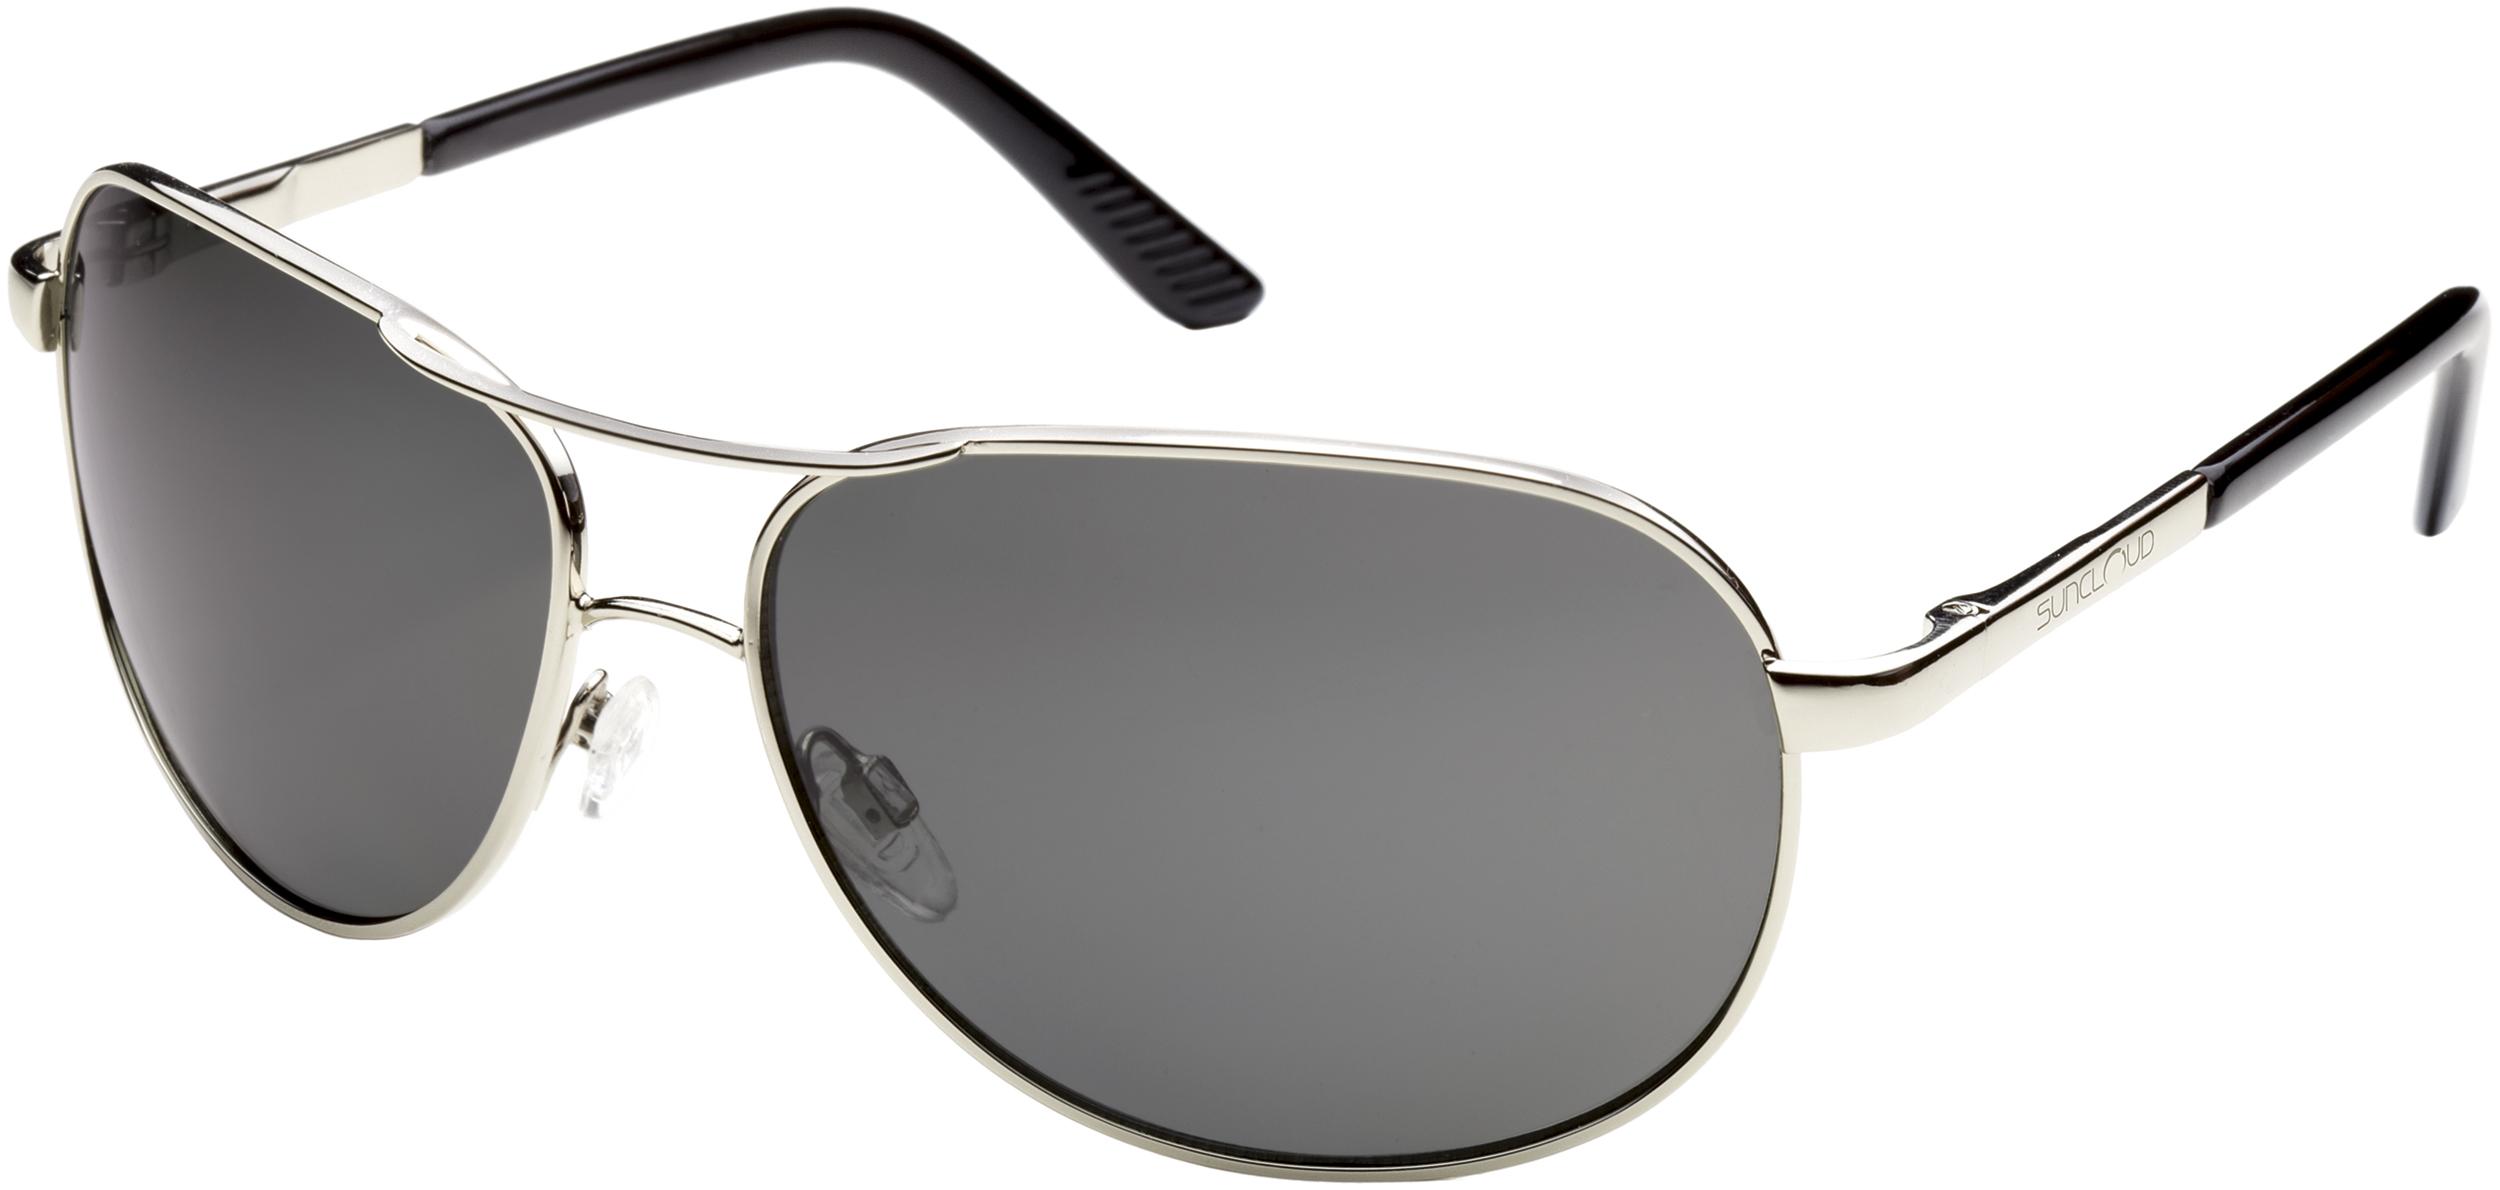 252ebeb73fc Suncloud Aviator Polarized Sunglasses - Unisex